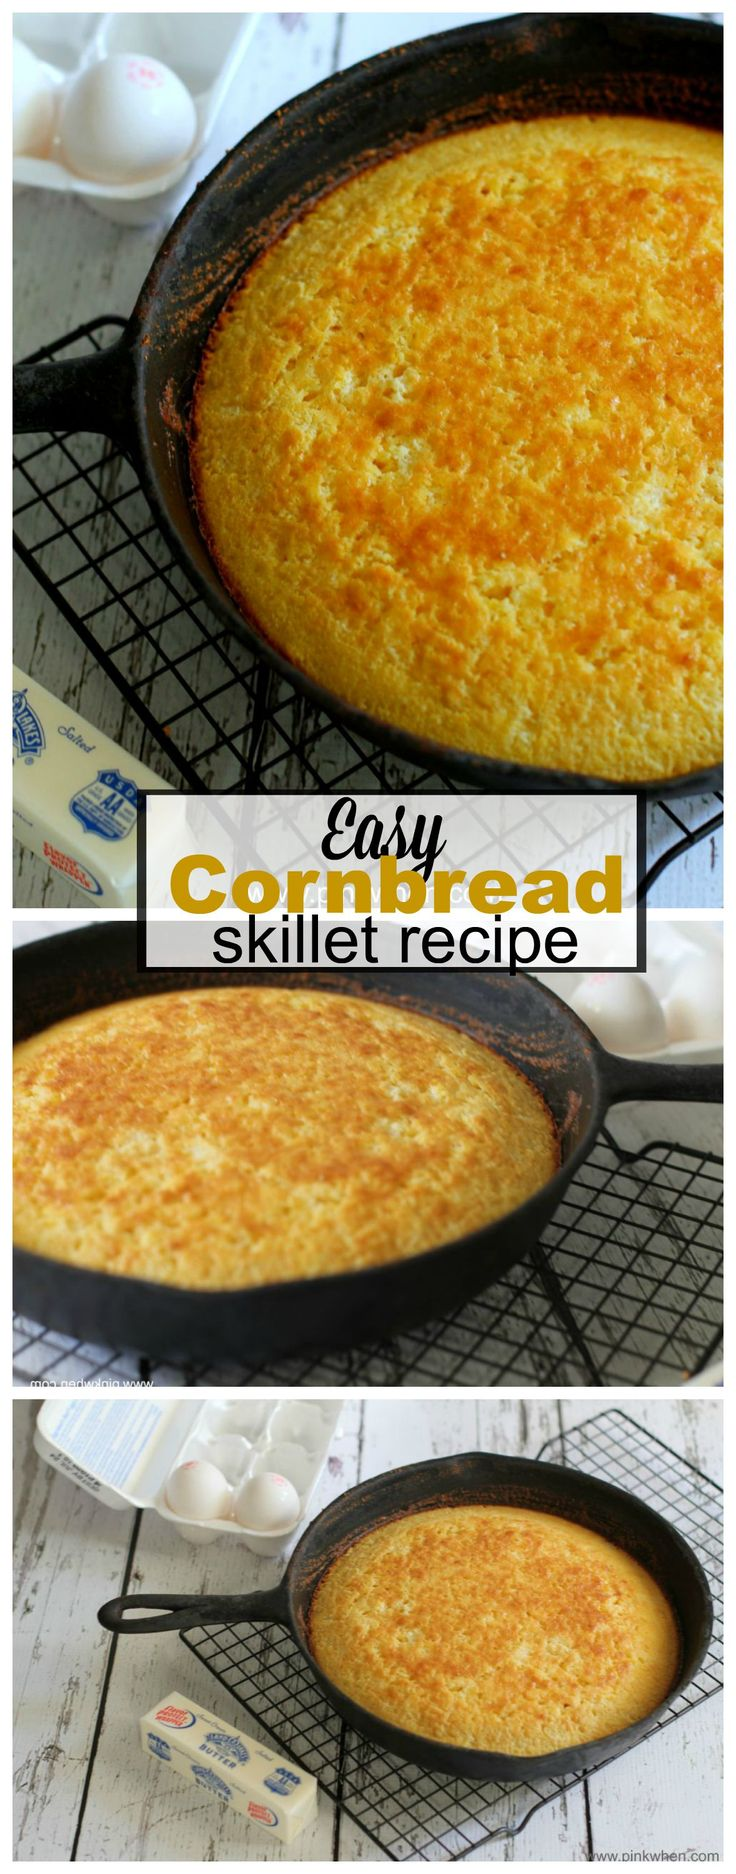 Easy Cornbread Skillet Recipe